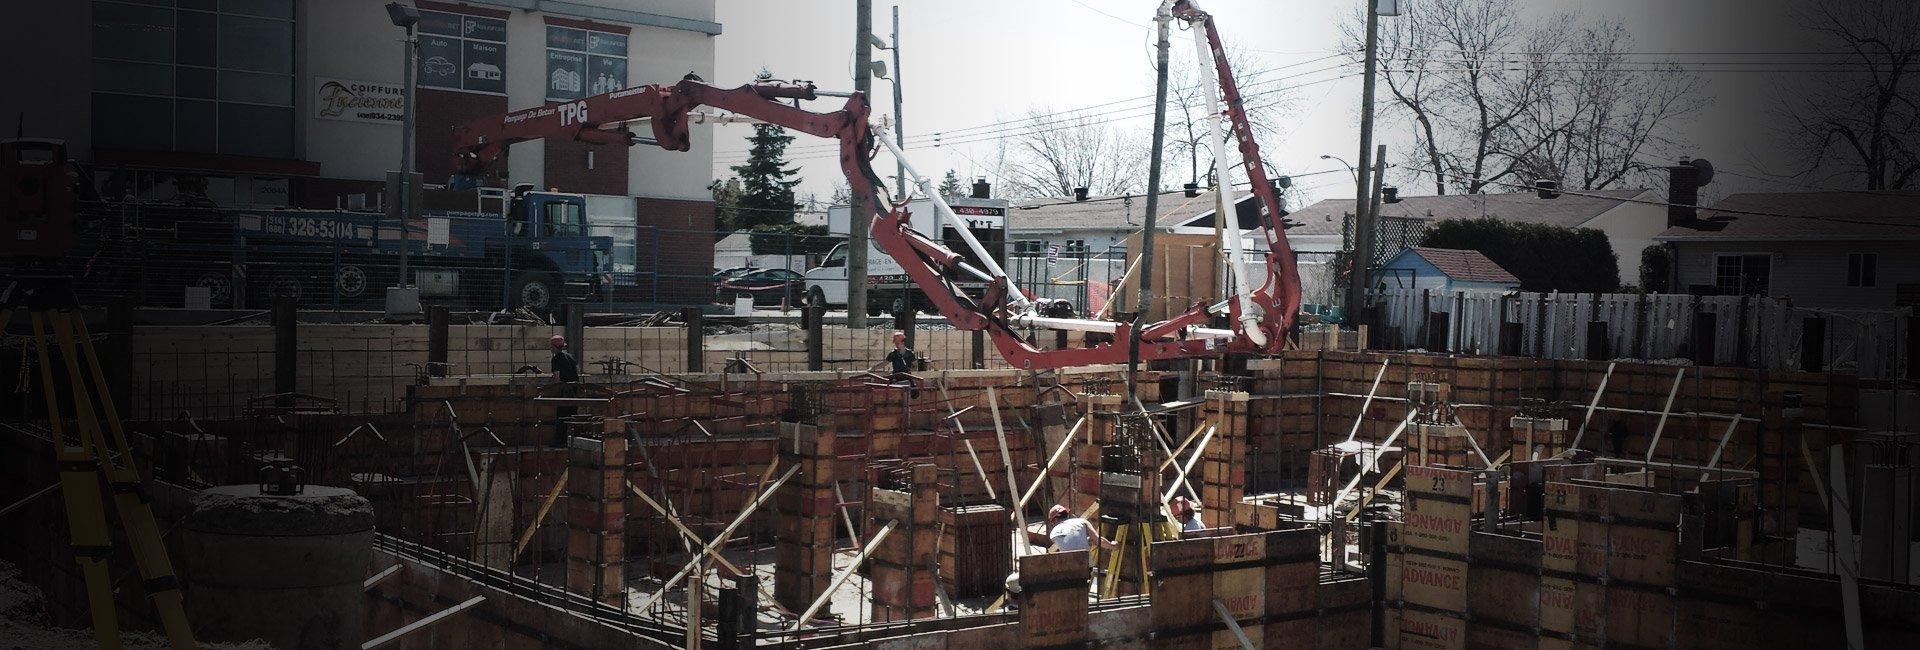 TPG Concrete Pumping documentation